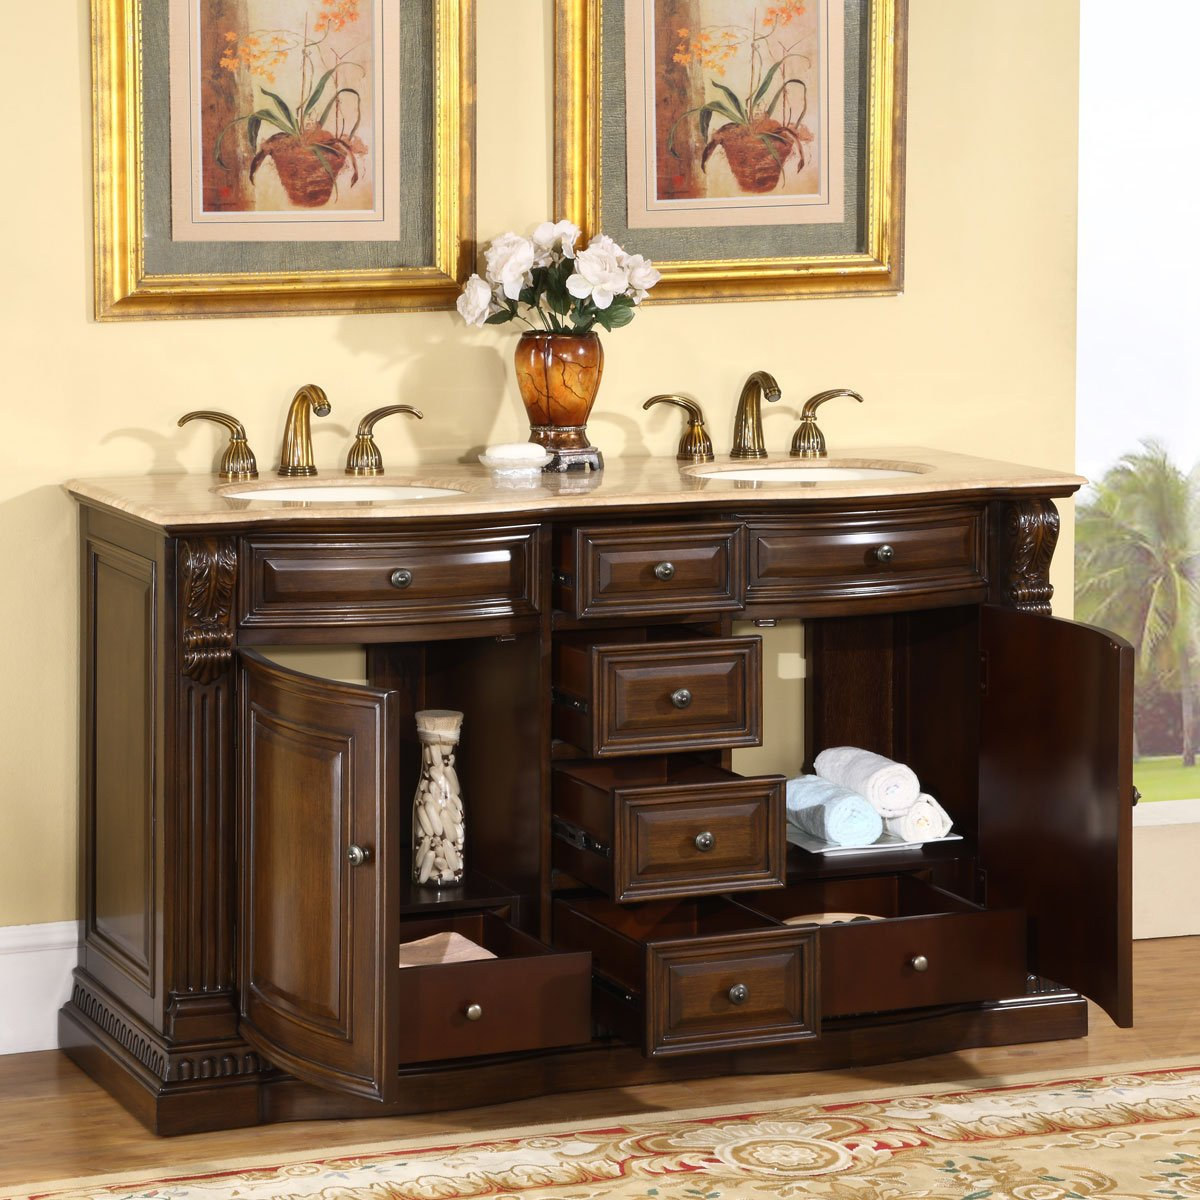 Amazon: Silkroad Exclusive Bathroom Vanity Hyp0712tuic60 Samantha 60